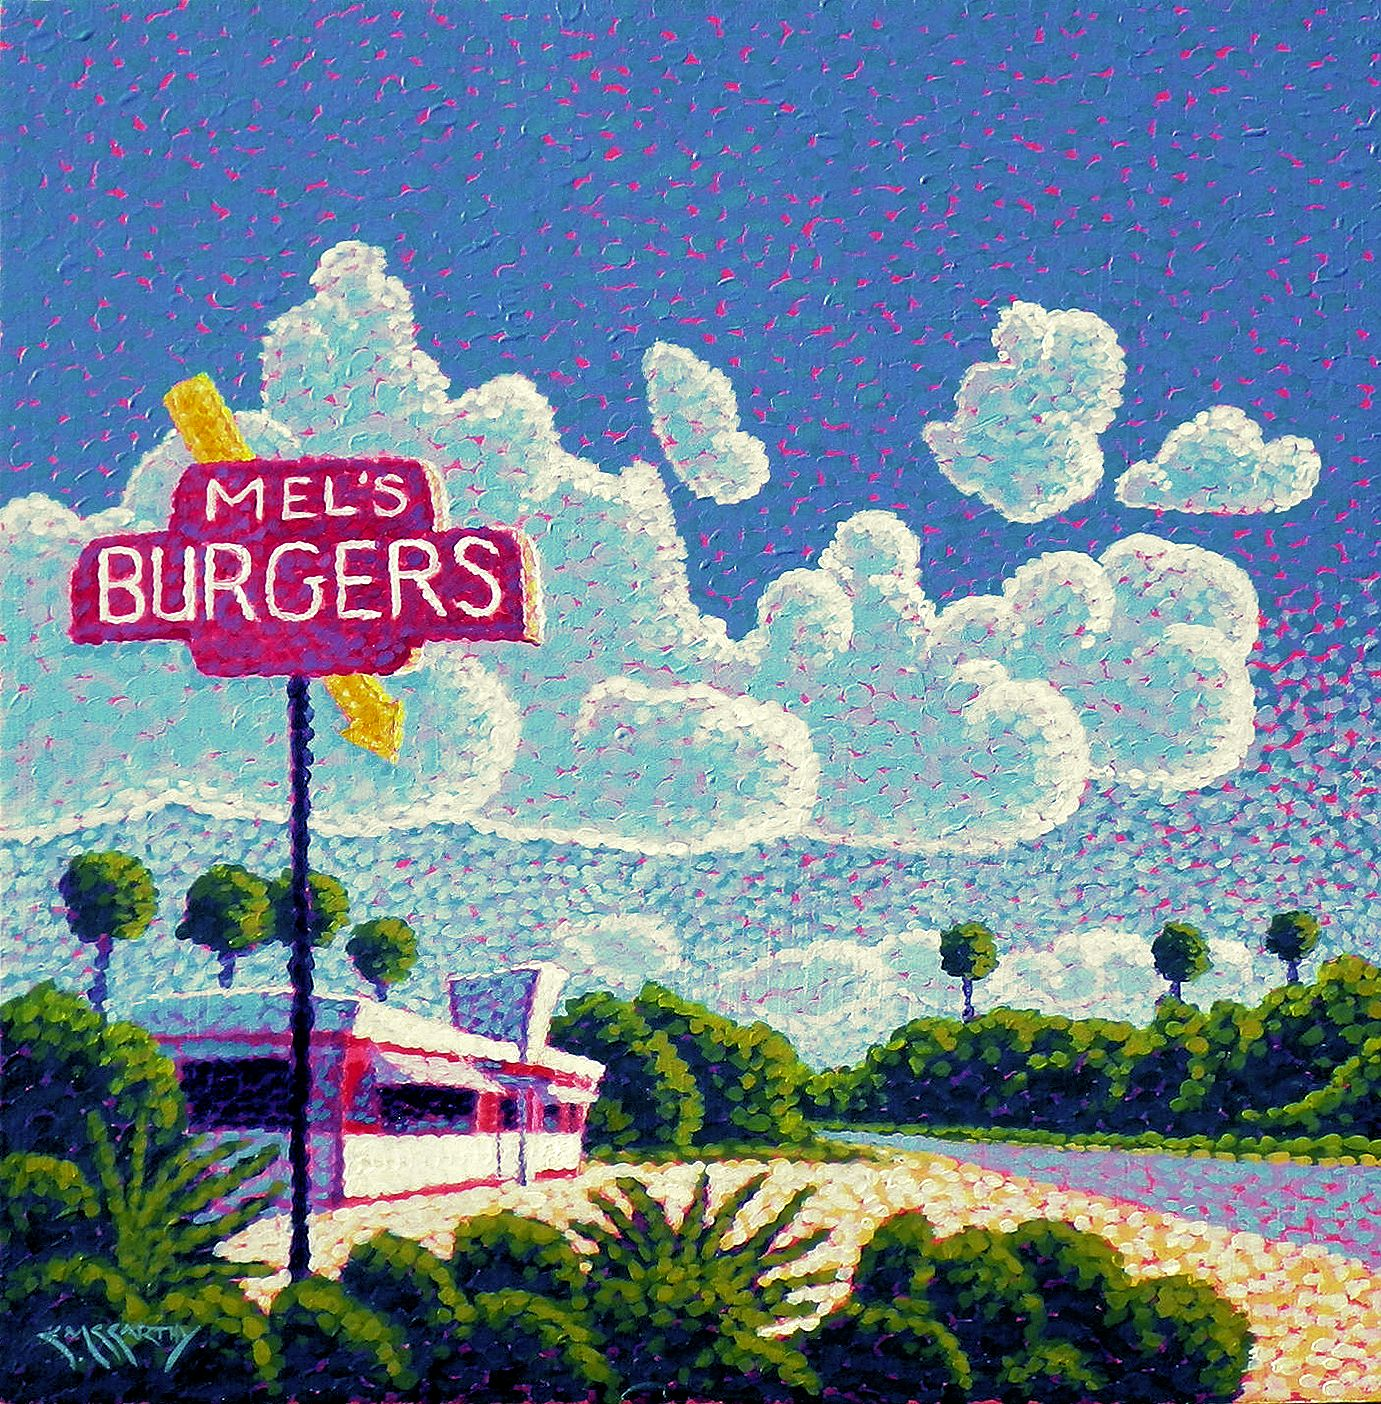 Paradise Found: Mel's Burgers